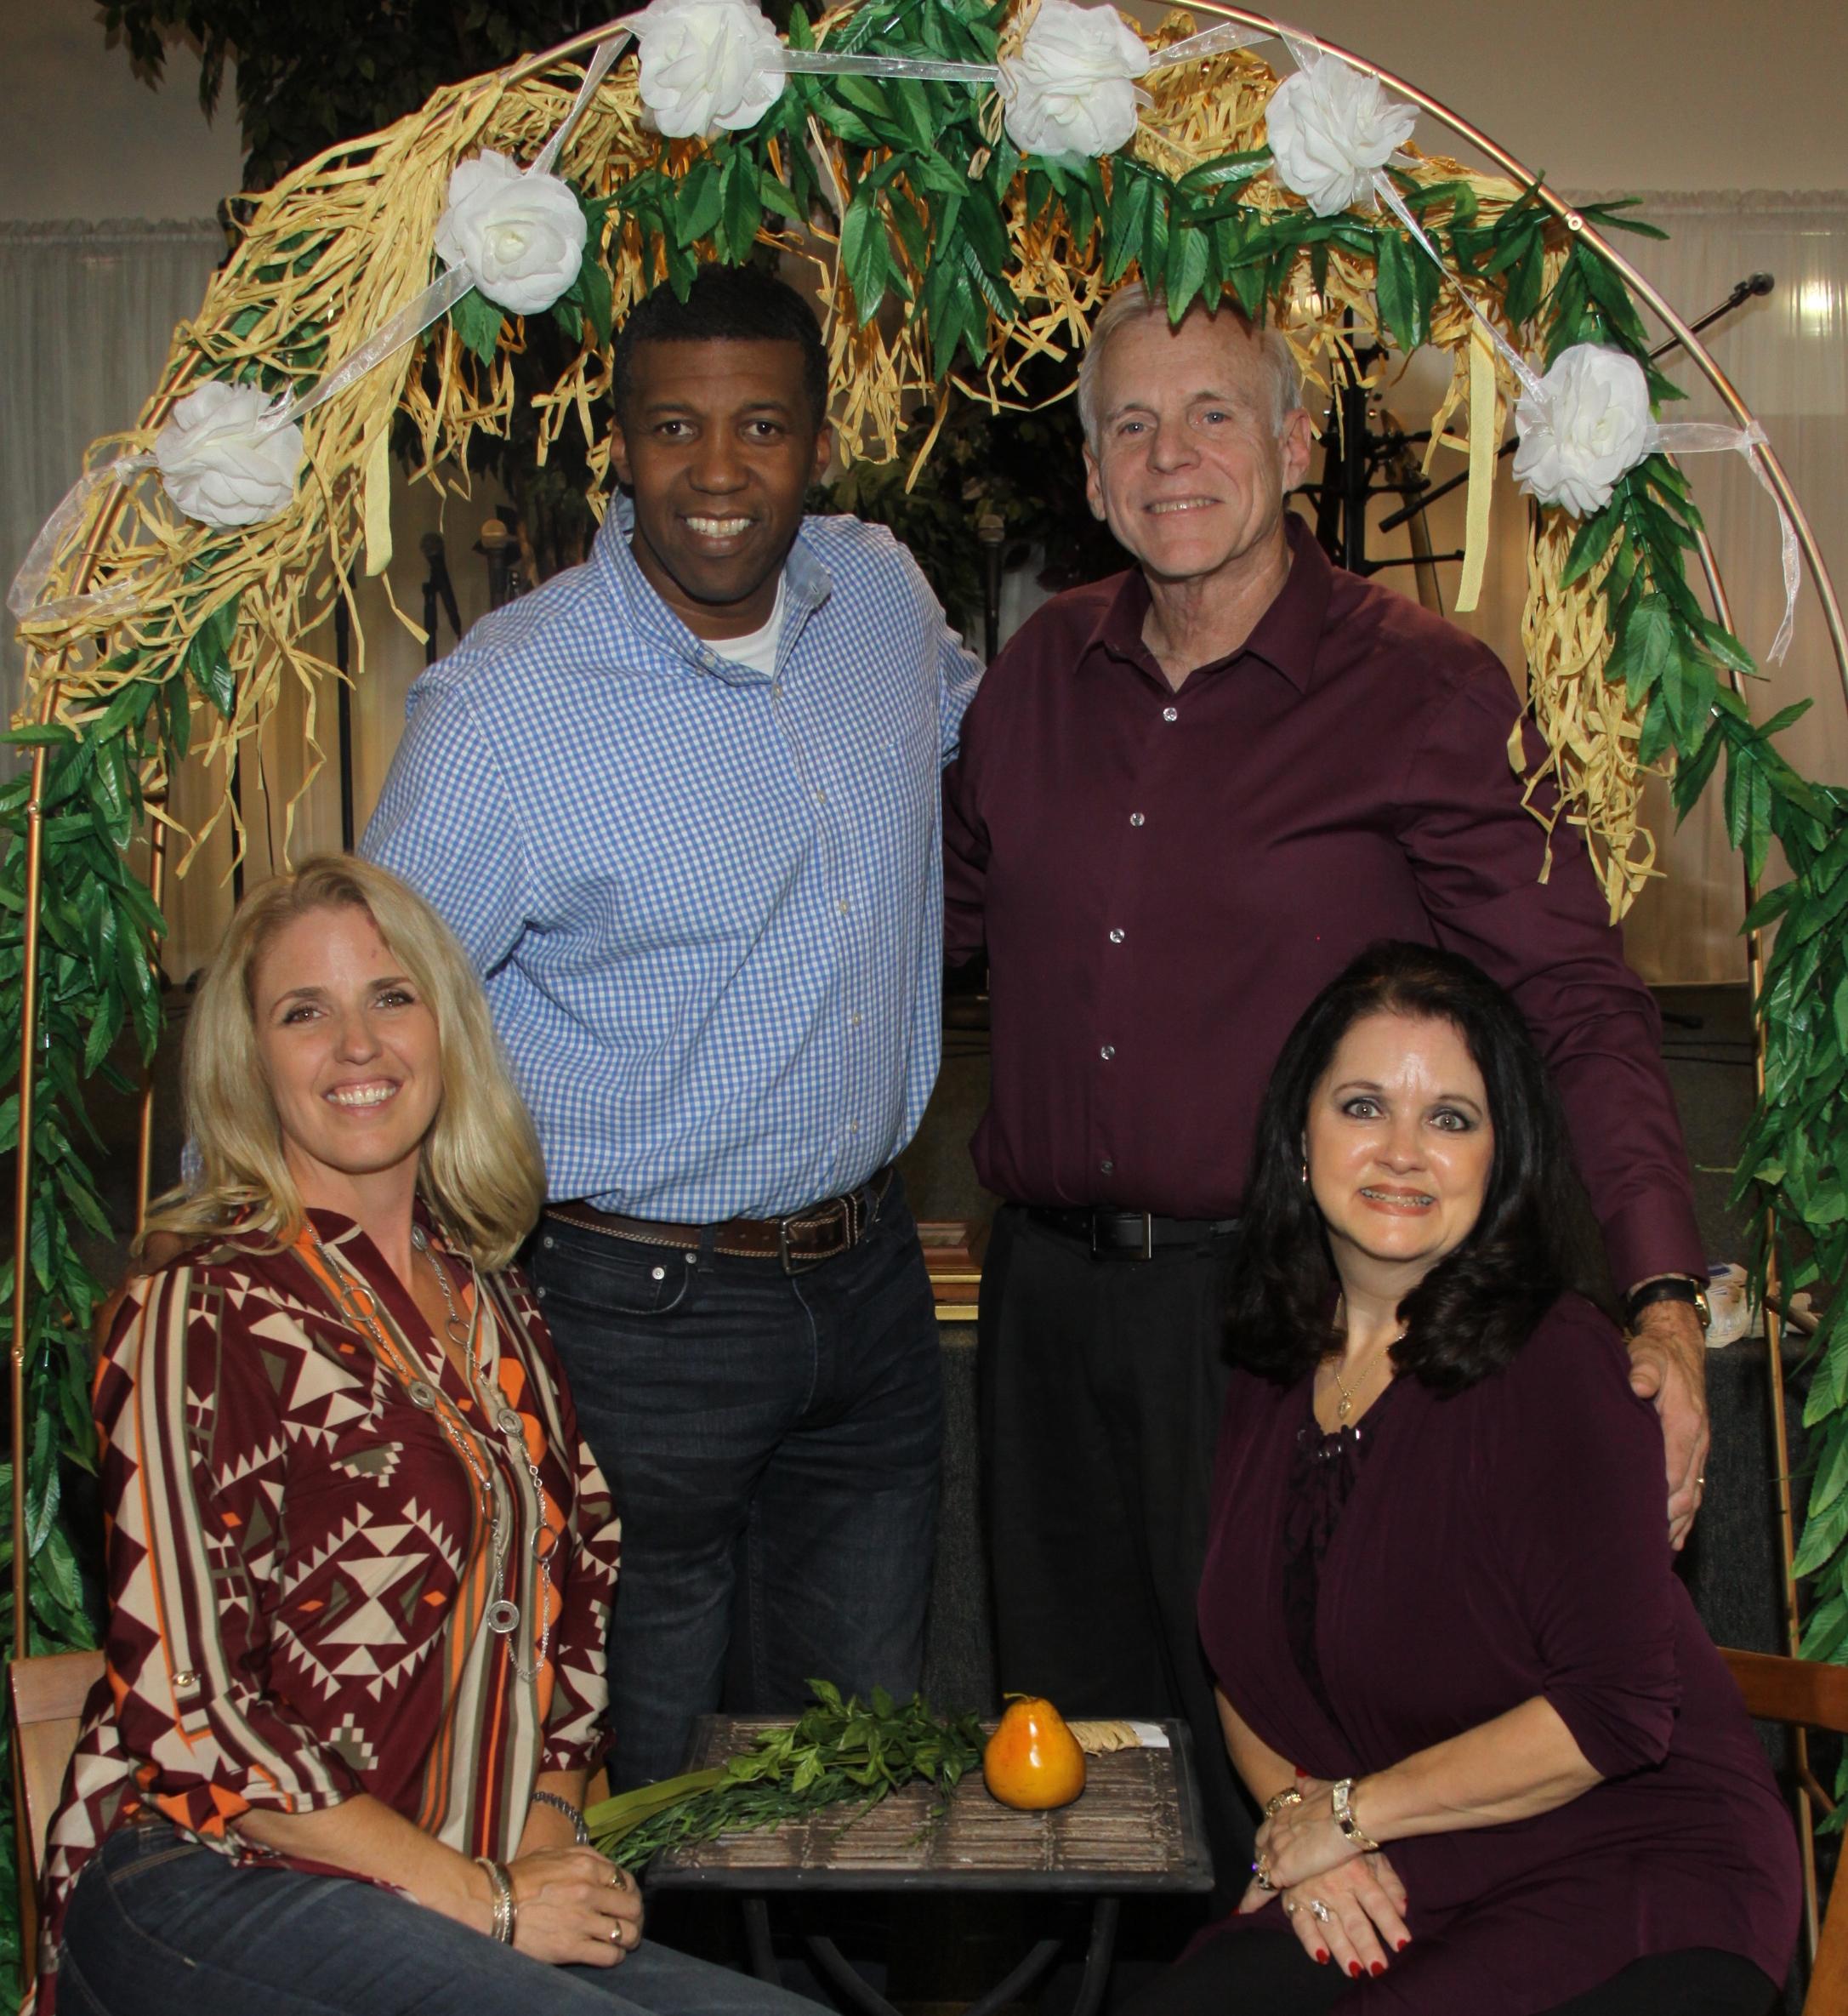 Senior pastors van & Regina smith